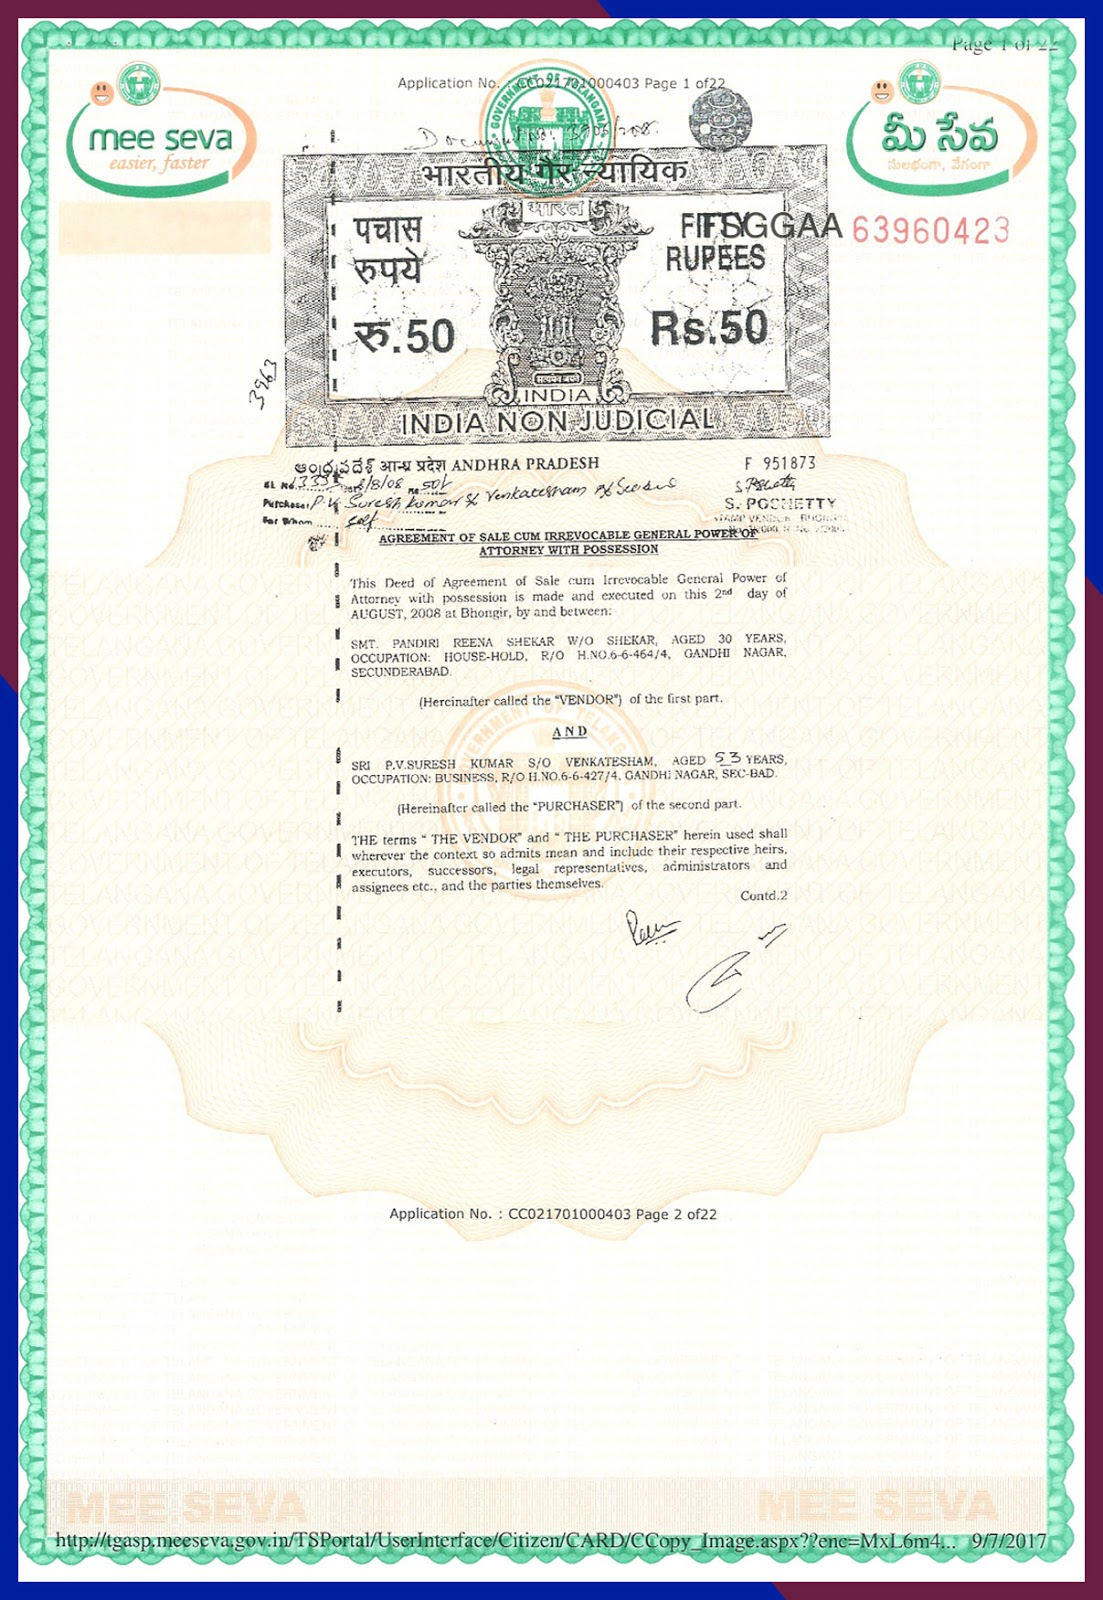 Agreement of Sale cum GPA date 2-8-2008